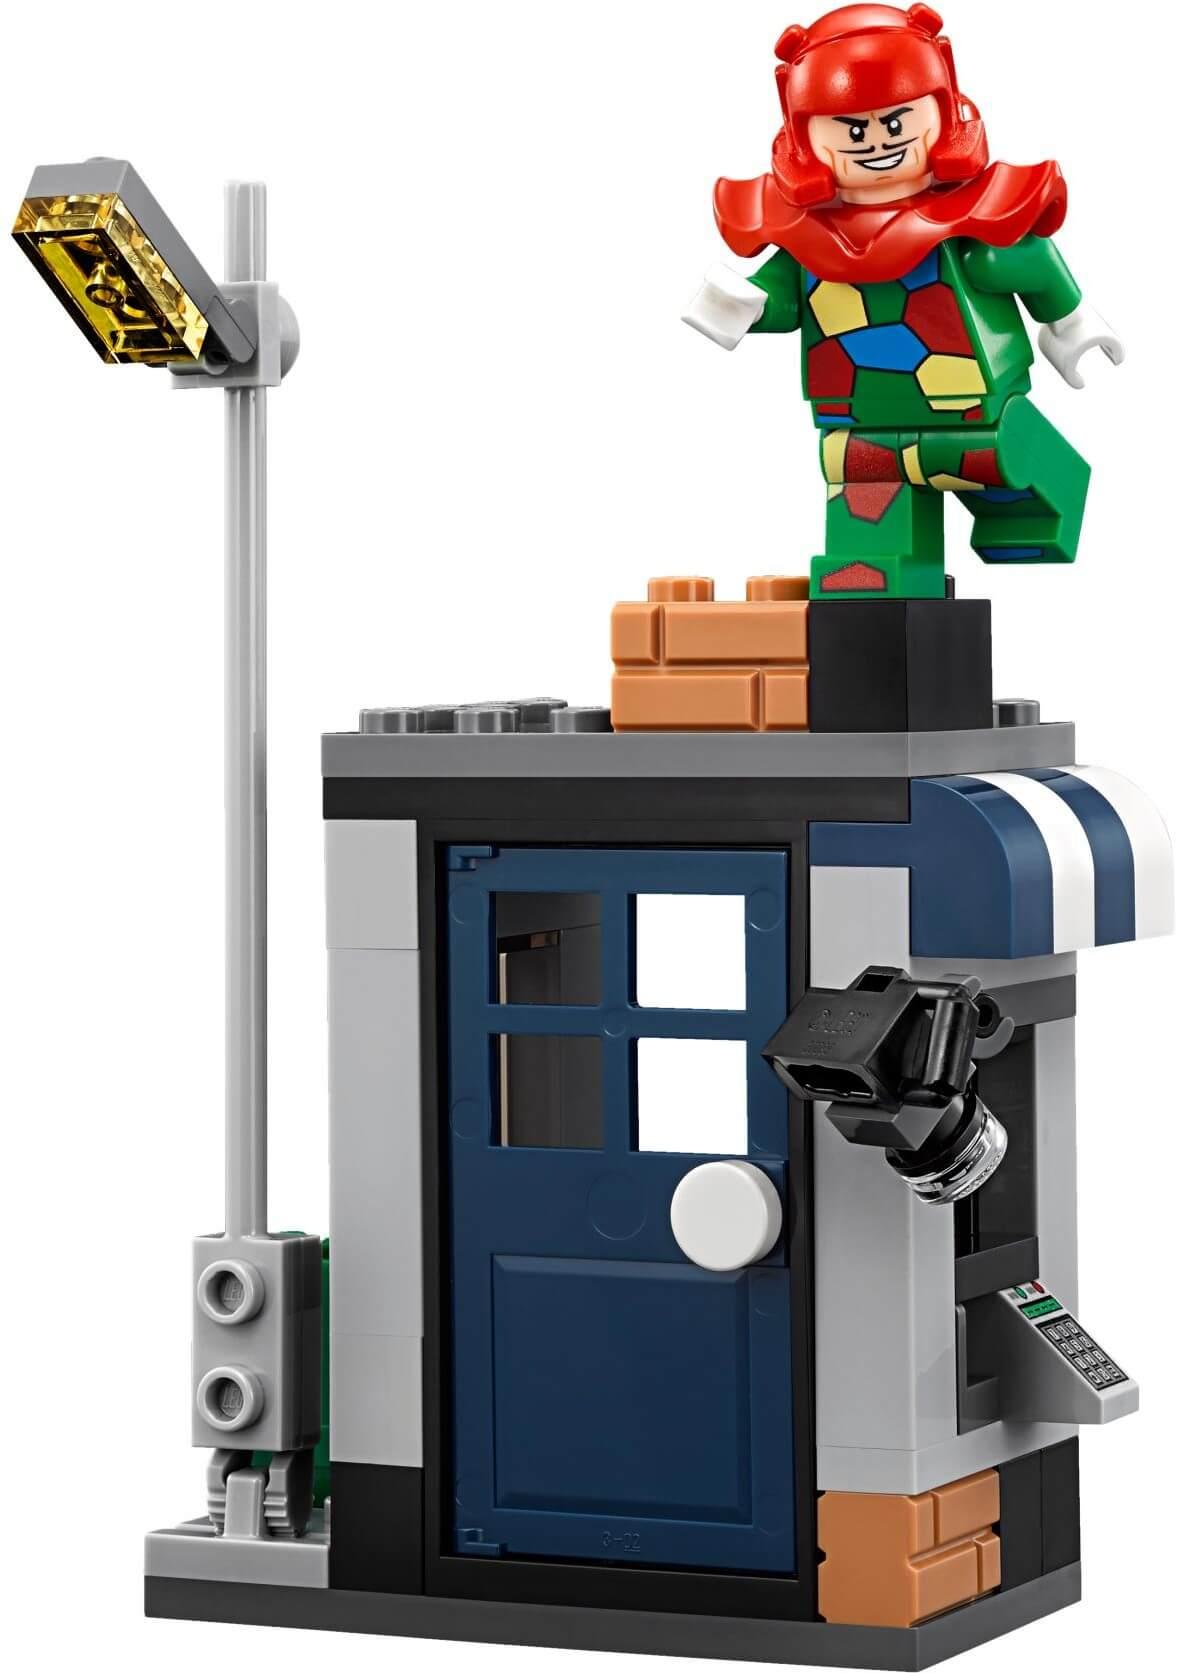 Mua đồ chơi LEGO 70921 - LEGO The Batman Movie 70921 - Xe Bắn Pháo Harley Quinn (LEGO The Batman Movie 70921 Harley Quinn Cannonball Attack)